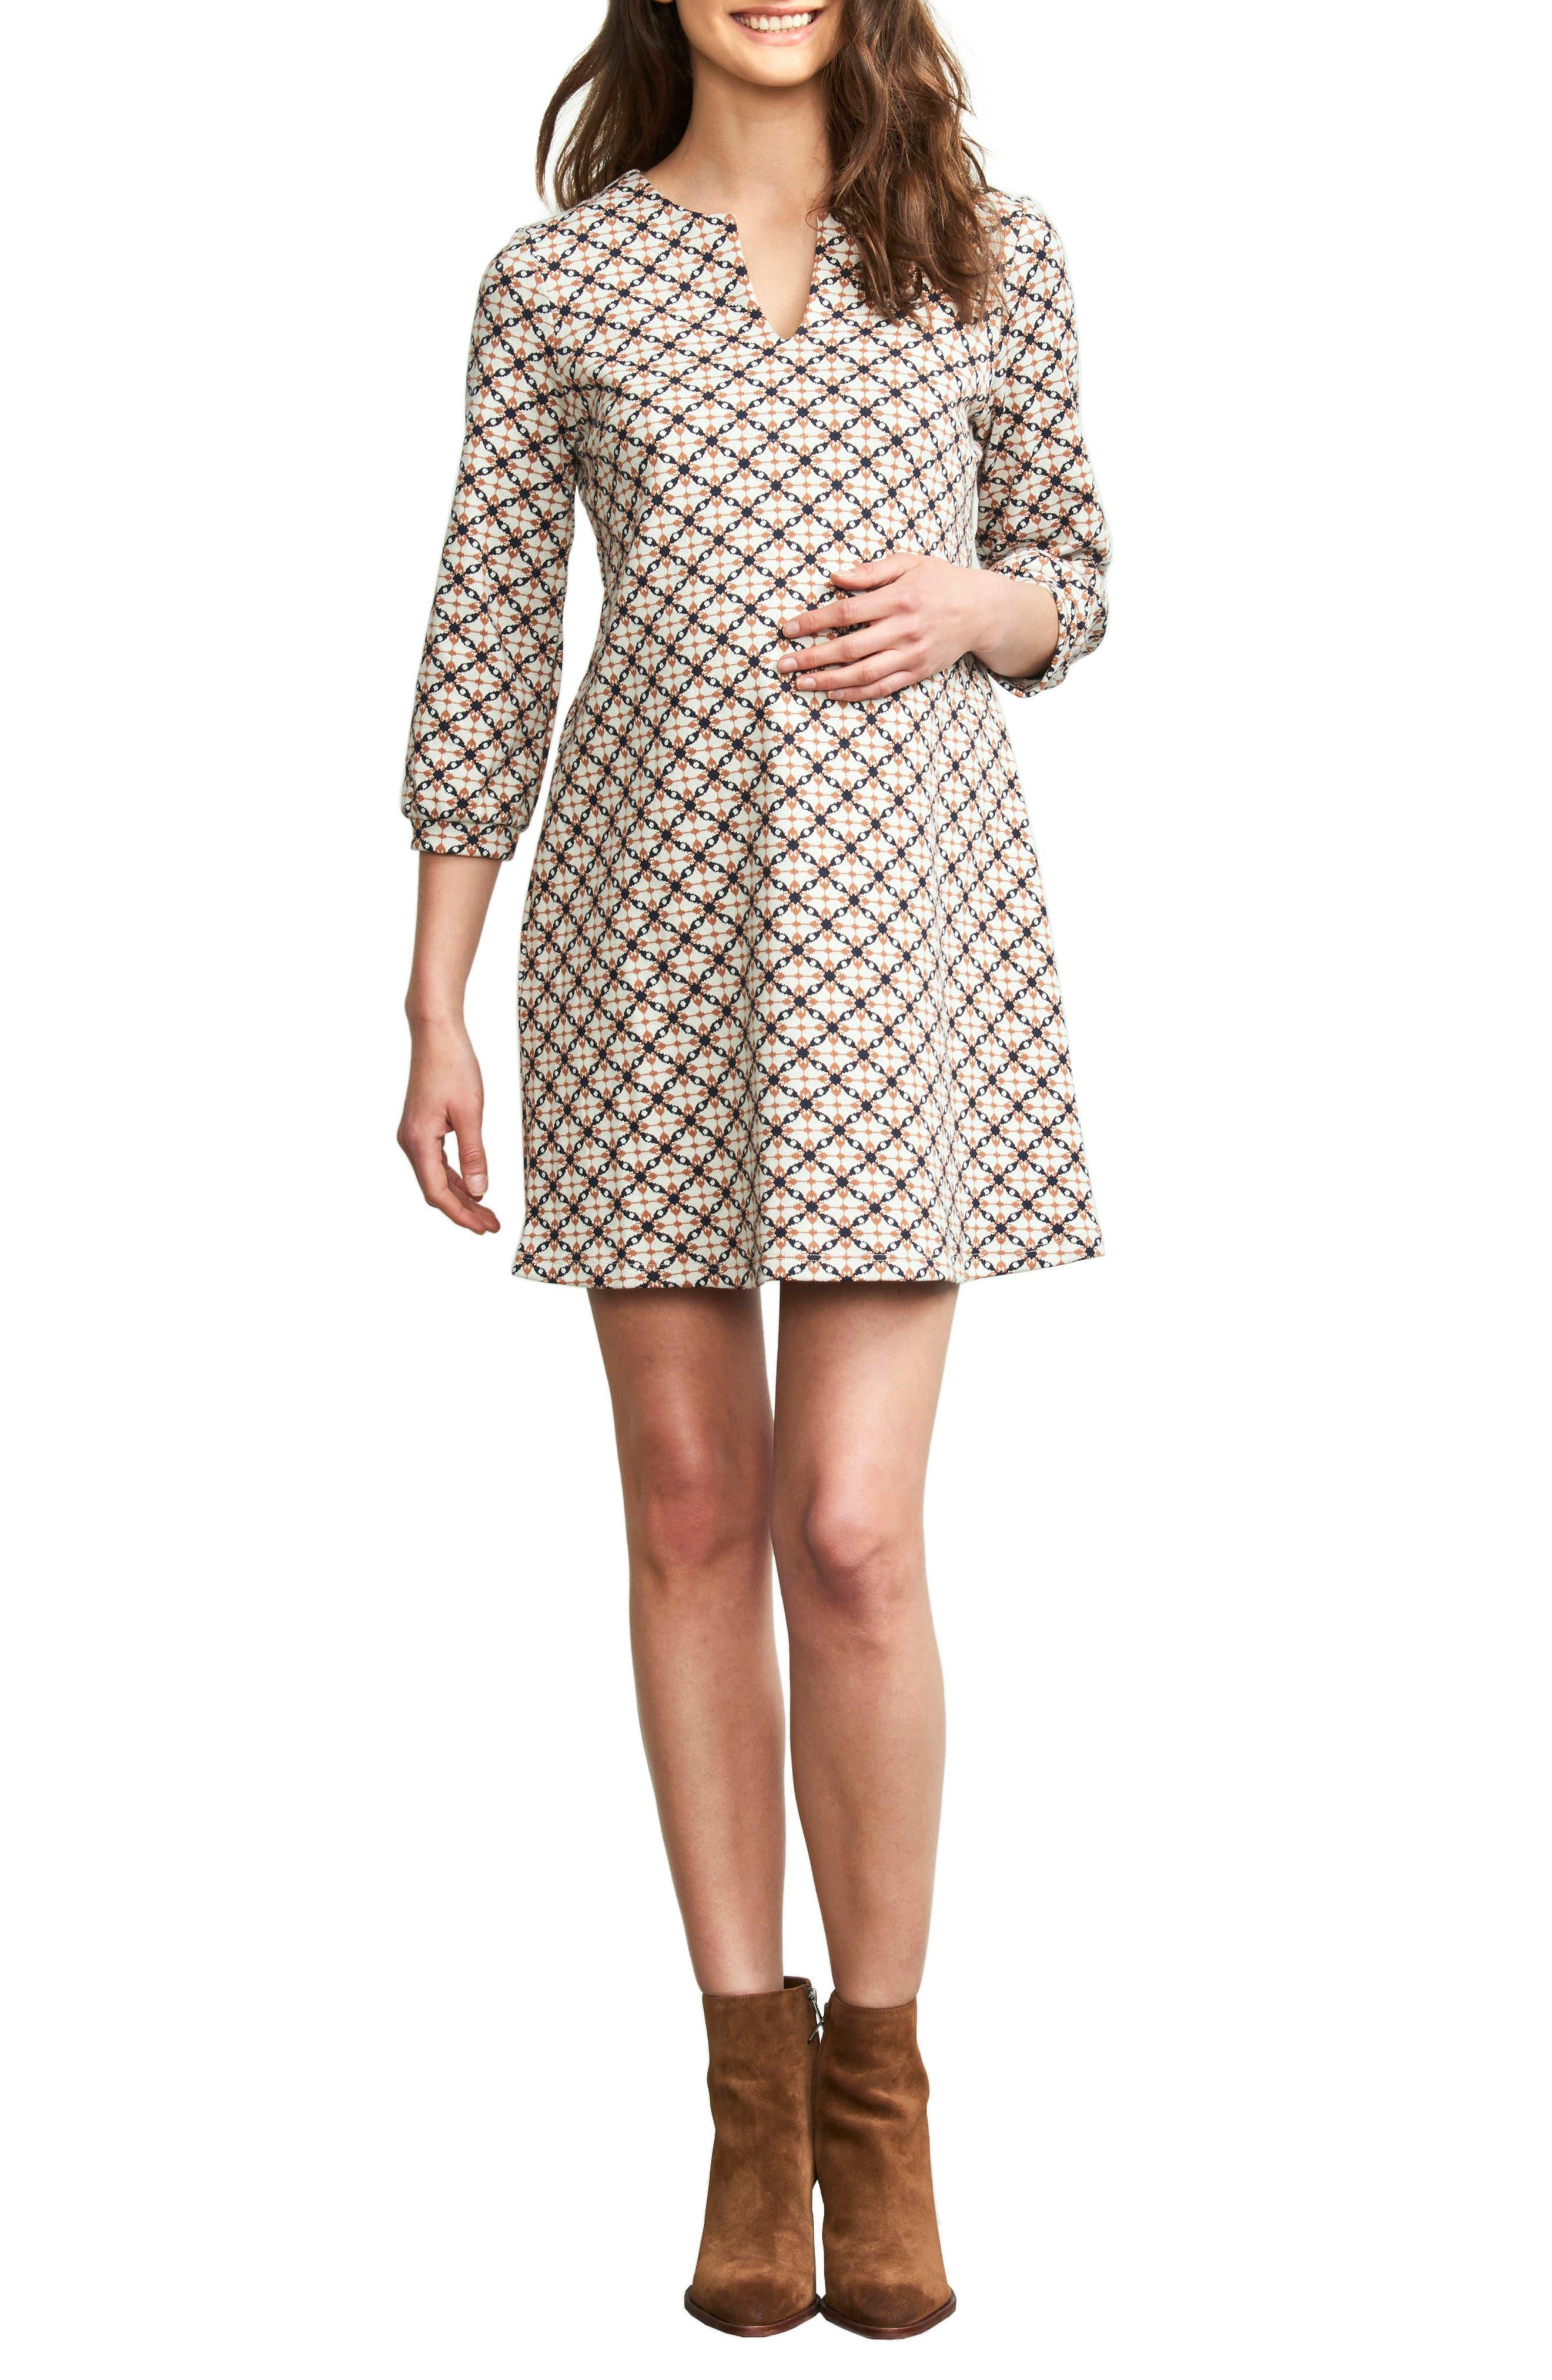 Alternate Image 1 Selected - Maternal America 'Vintage Pearls' Maternity Dress